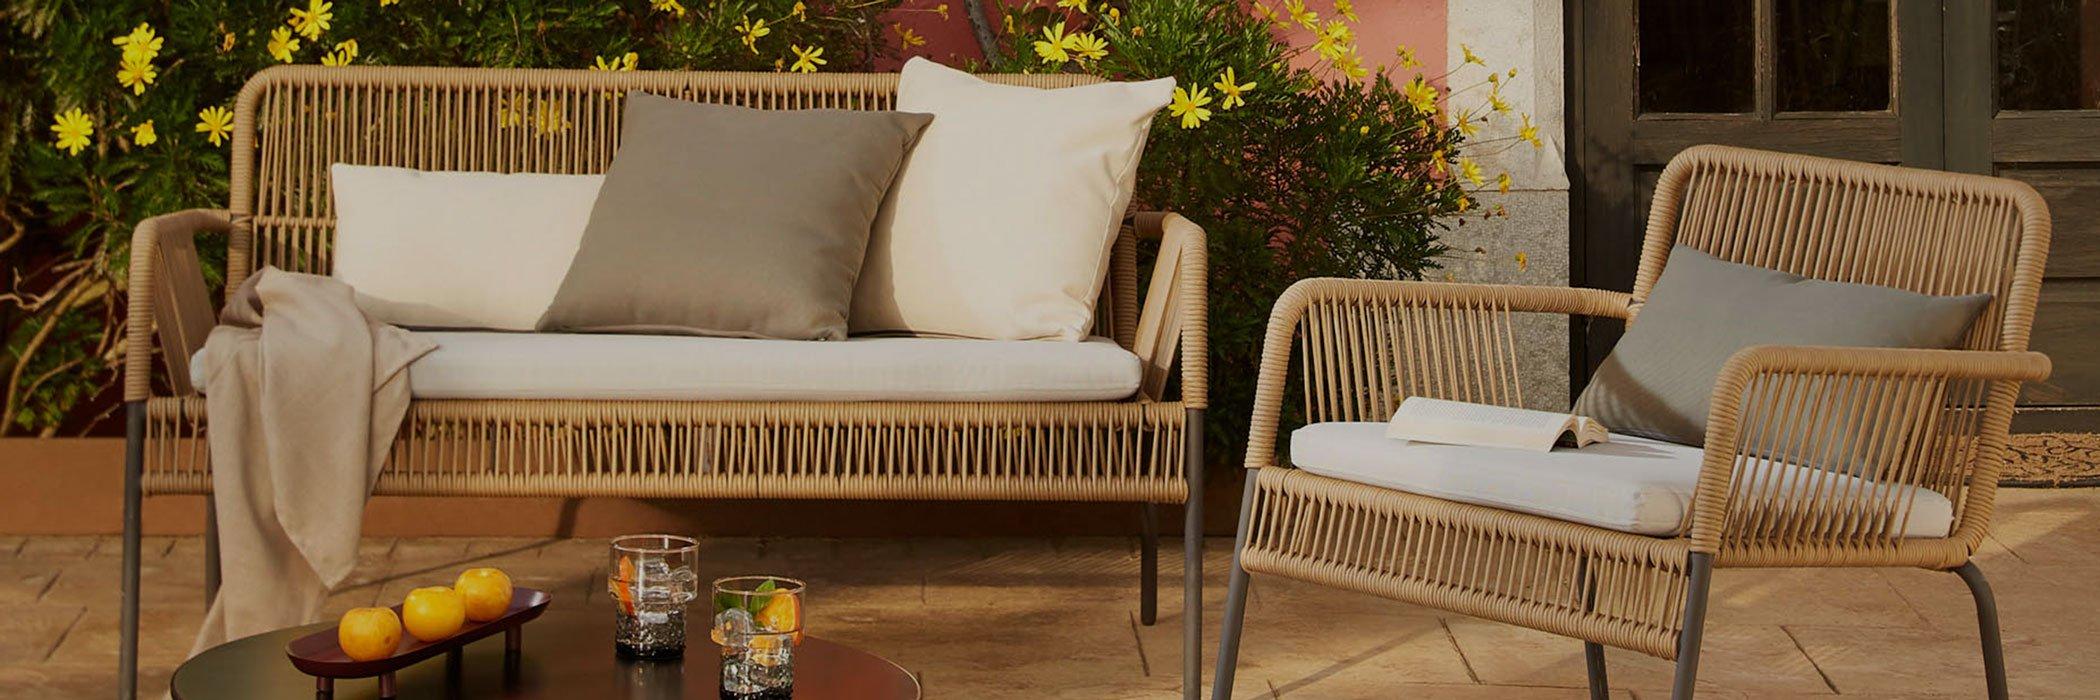 muebles-jardin-terraza-exterior.jpg